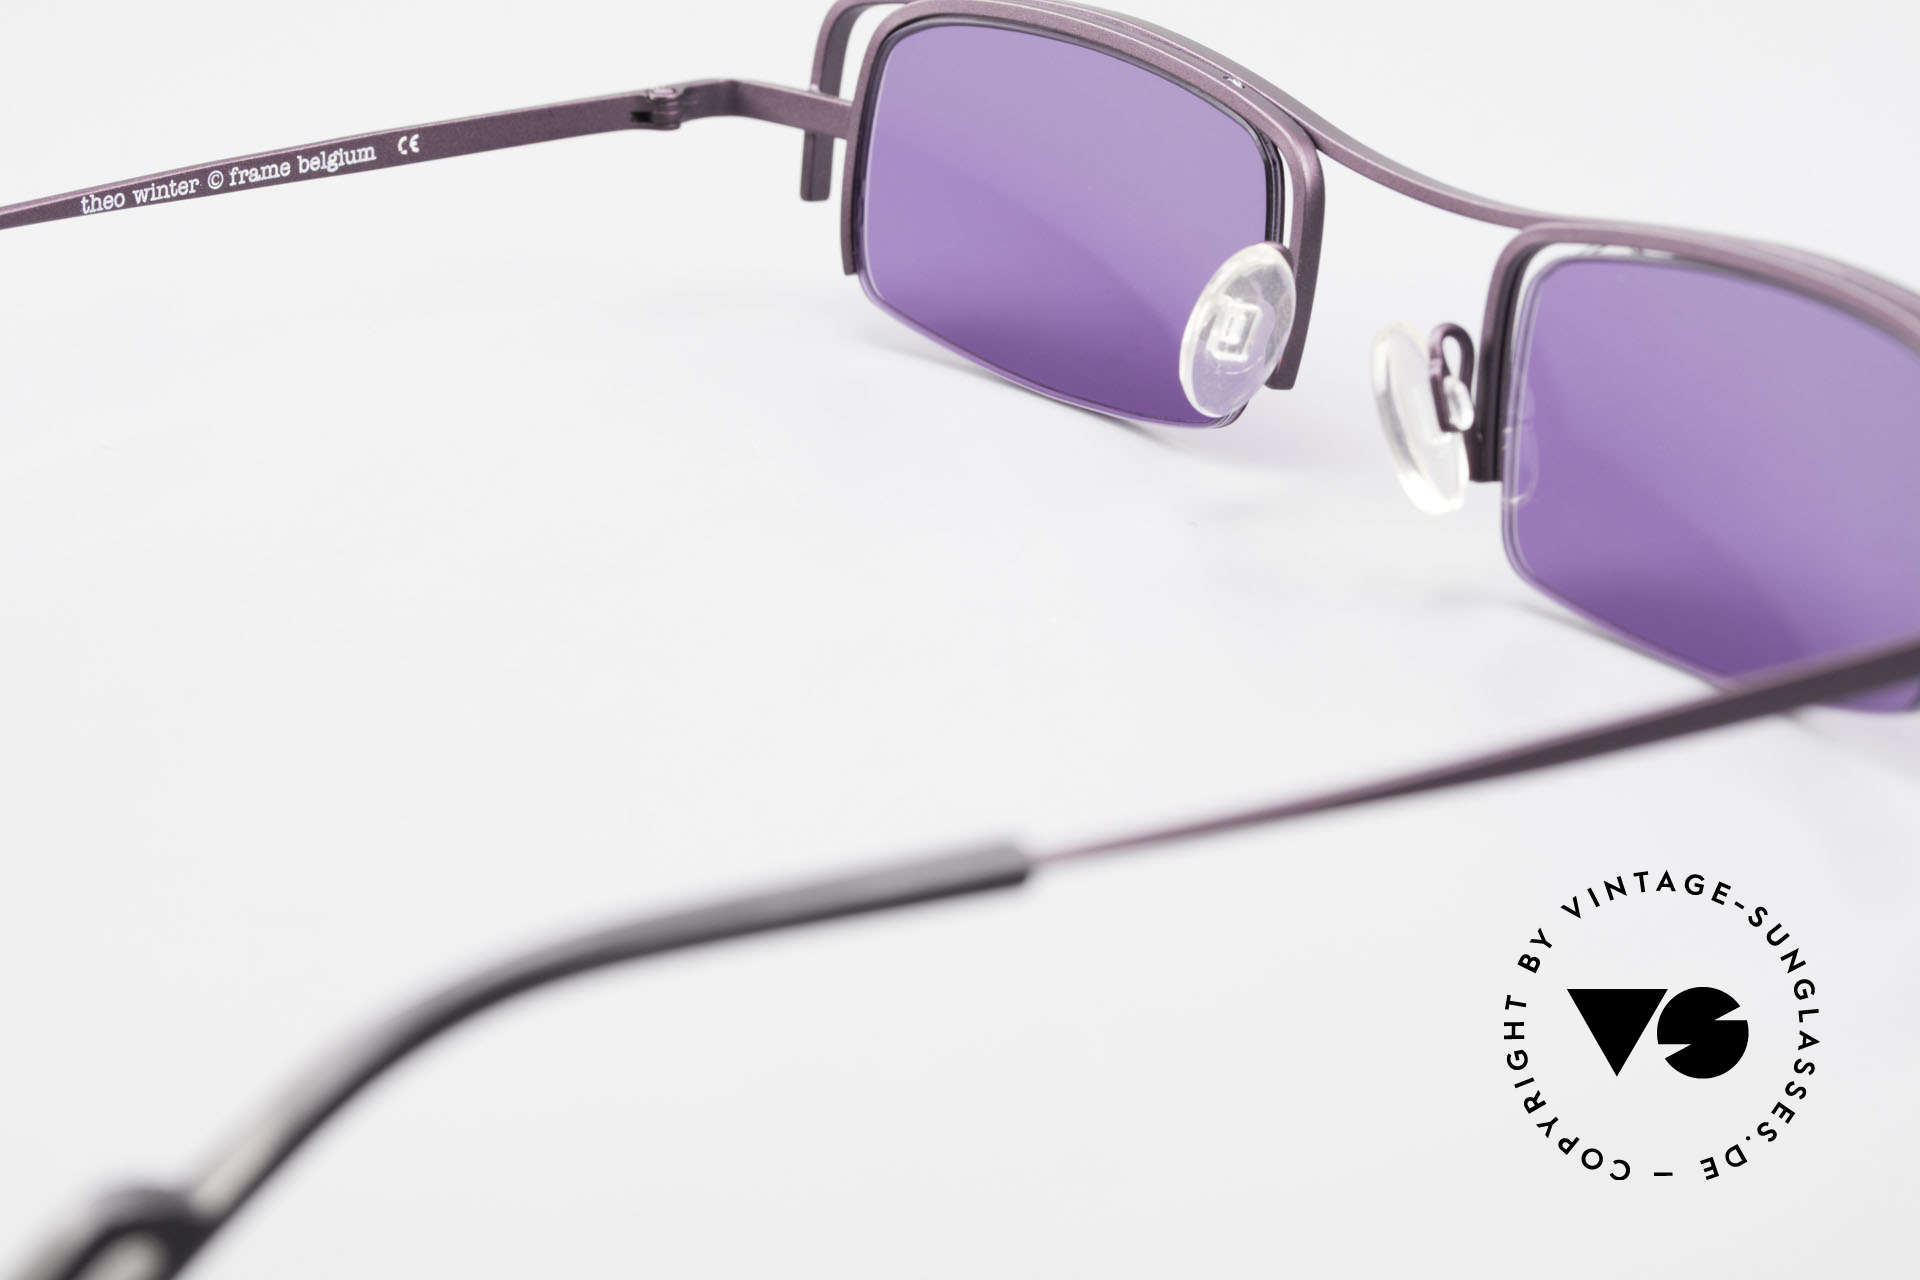 Theo Belgium Winter Ladies Designer Shades Square, so to speak: vintage sunglasses with representativeness, Made for Women